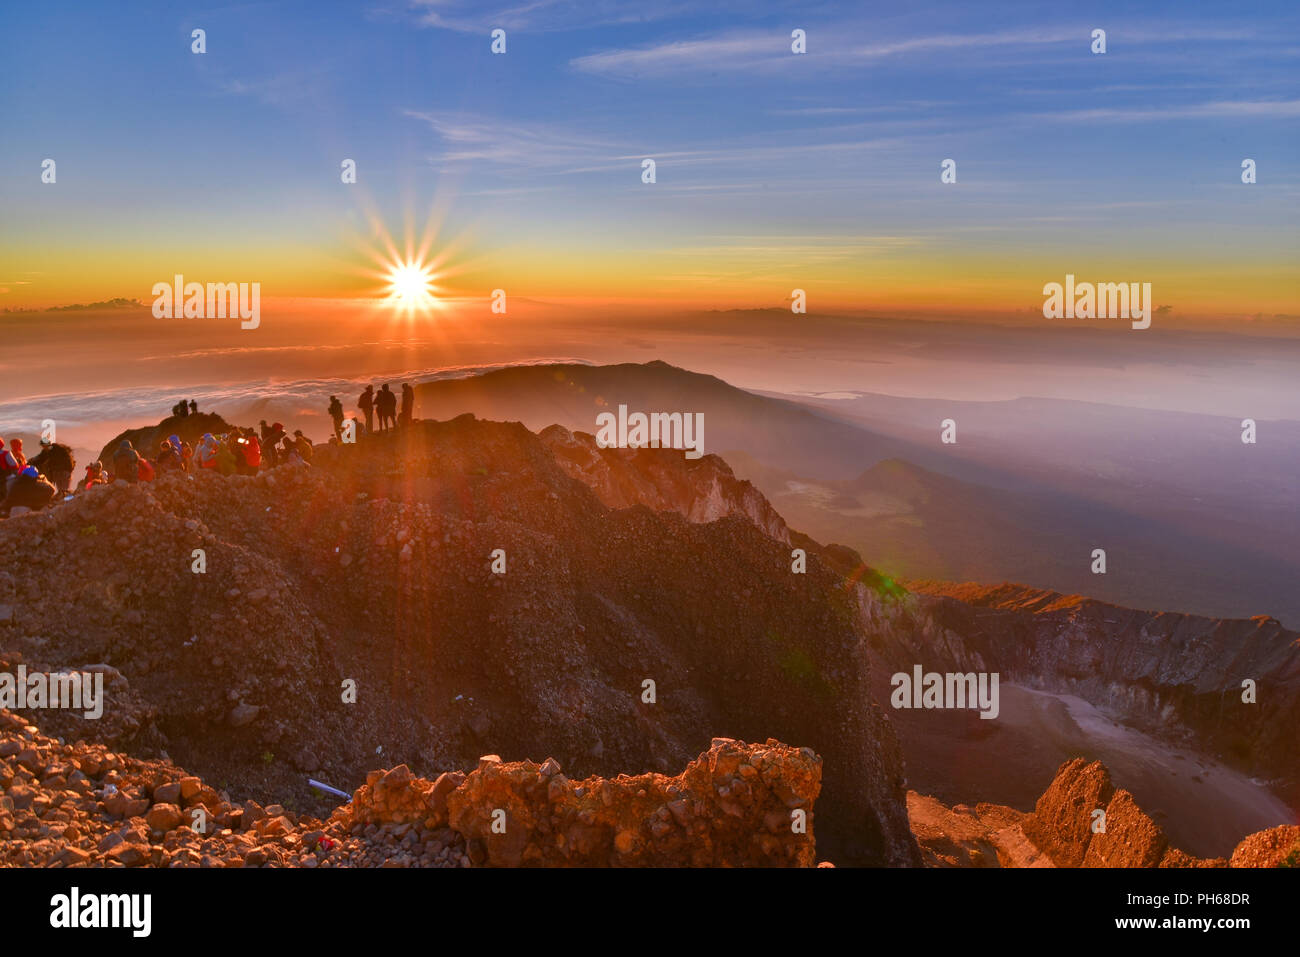 People on the summit of volcano Rinjani watching sunrise, Lombok, Indonesia - Stock Image